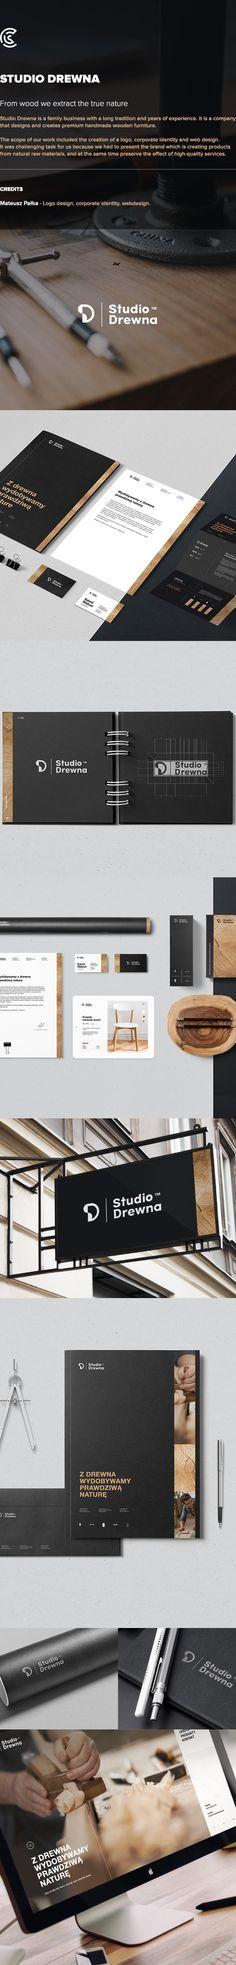 Studio Drewna on Behance